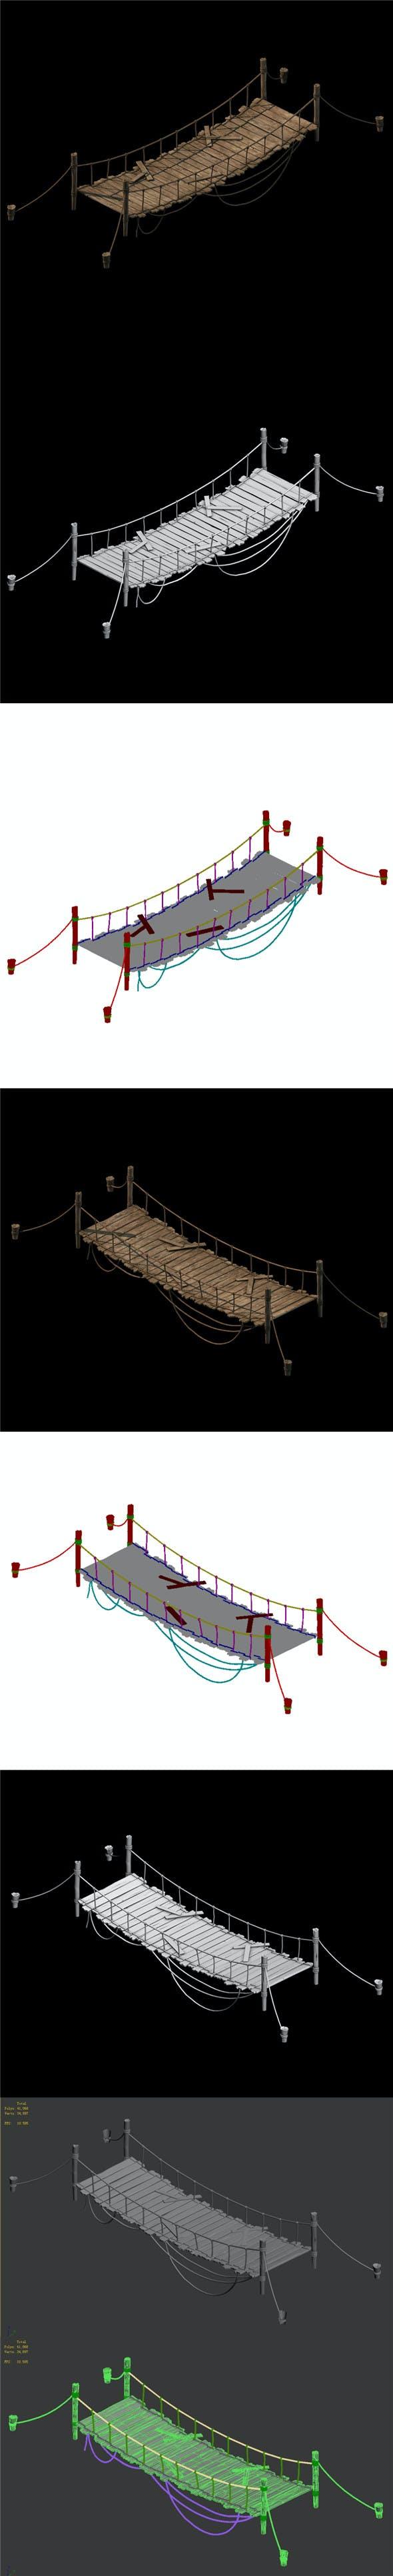 Sling - Wooden Bridge 03 - 3DOcean Item for Sale